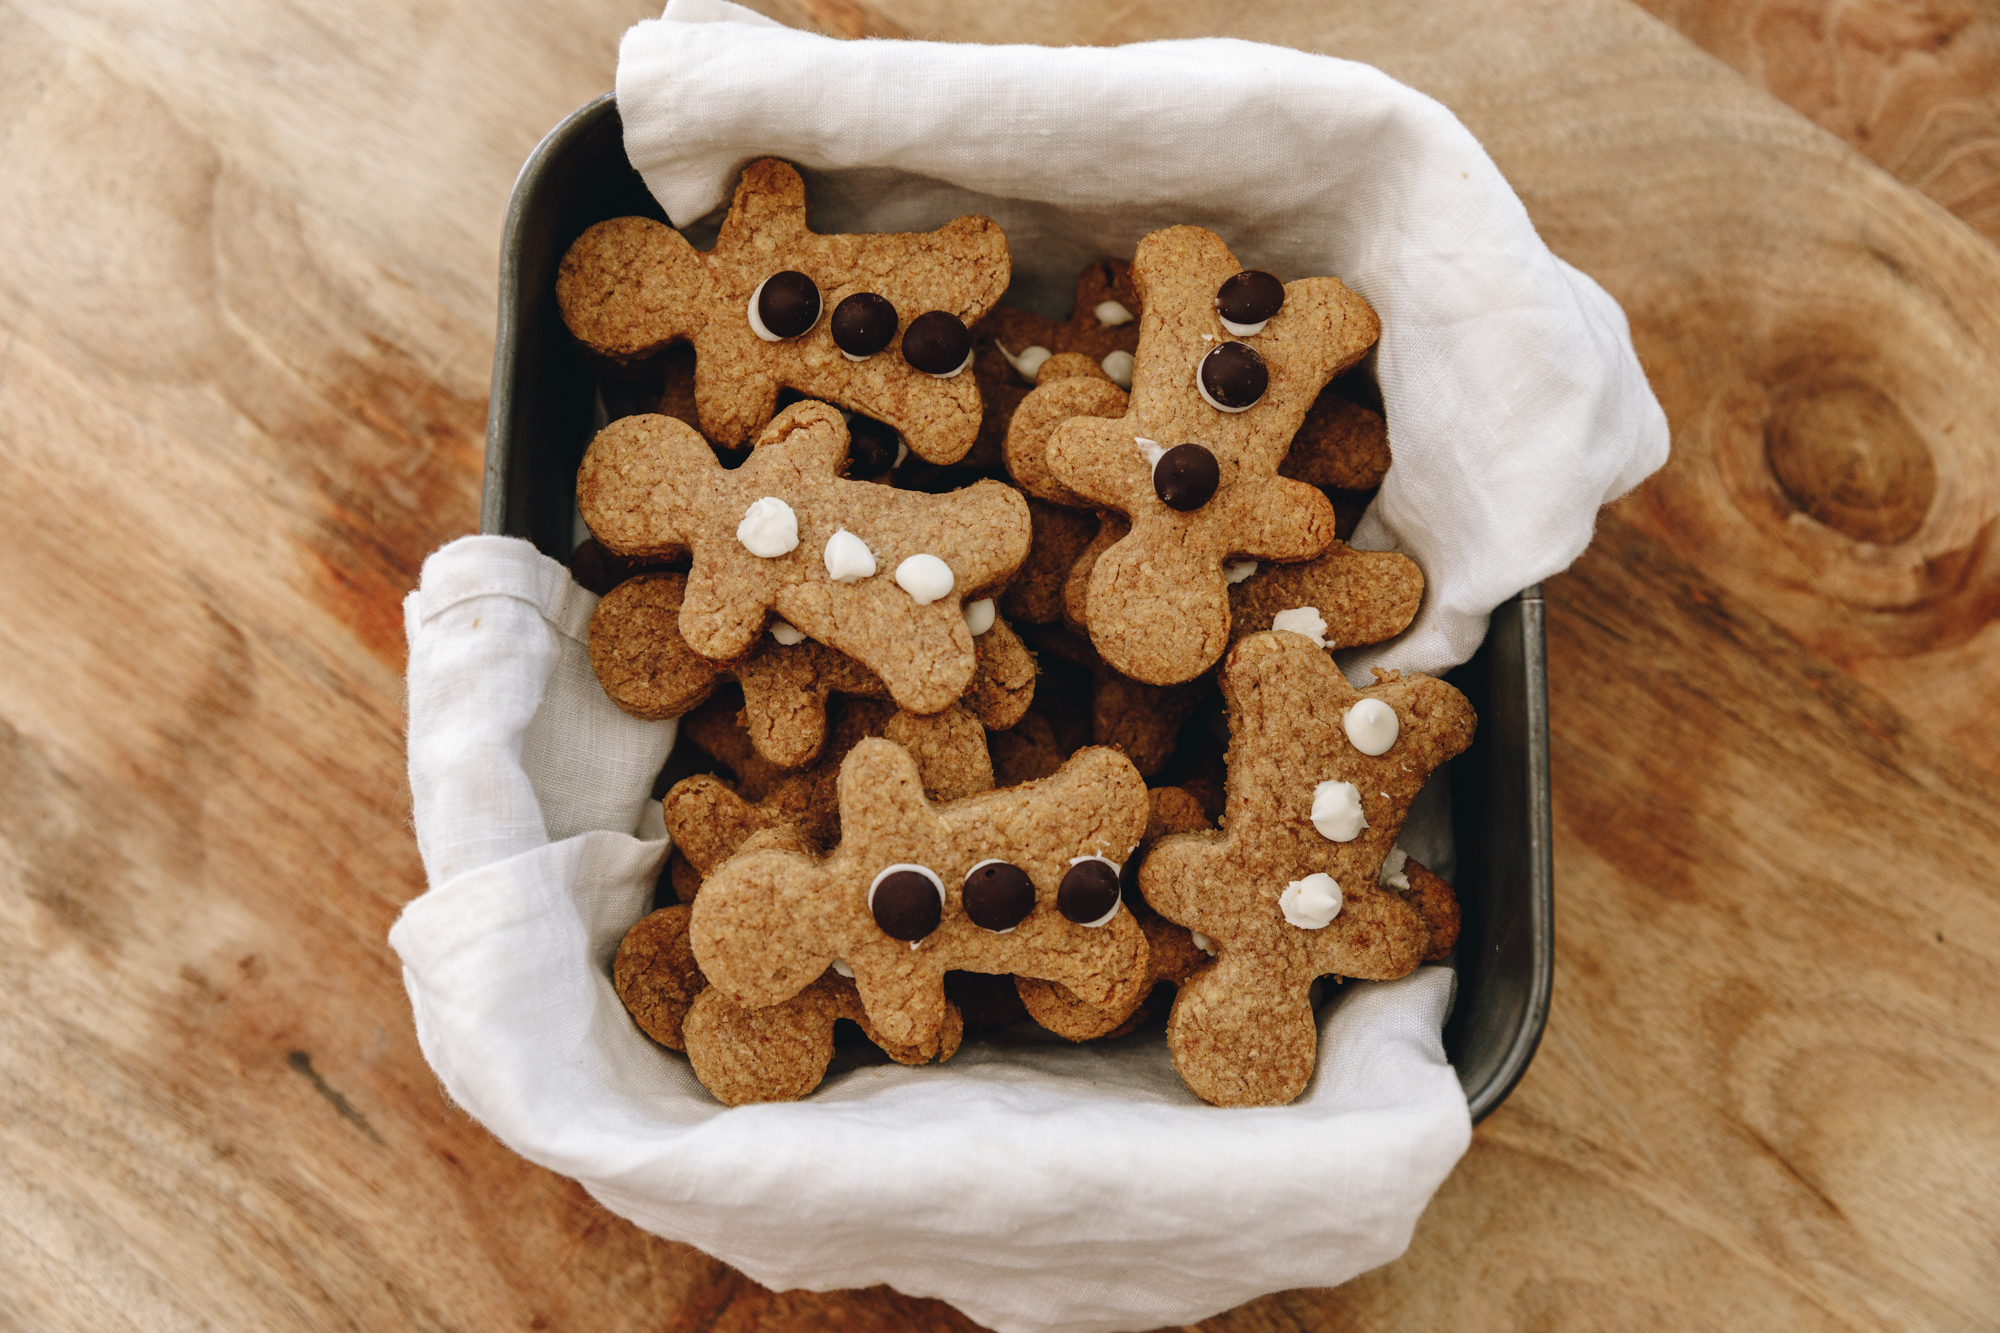 A tin full of gingerbread men cookies